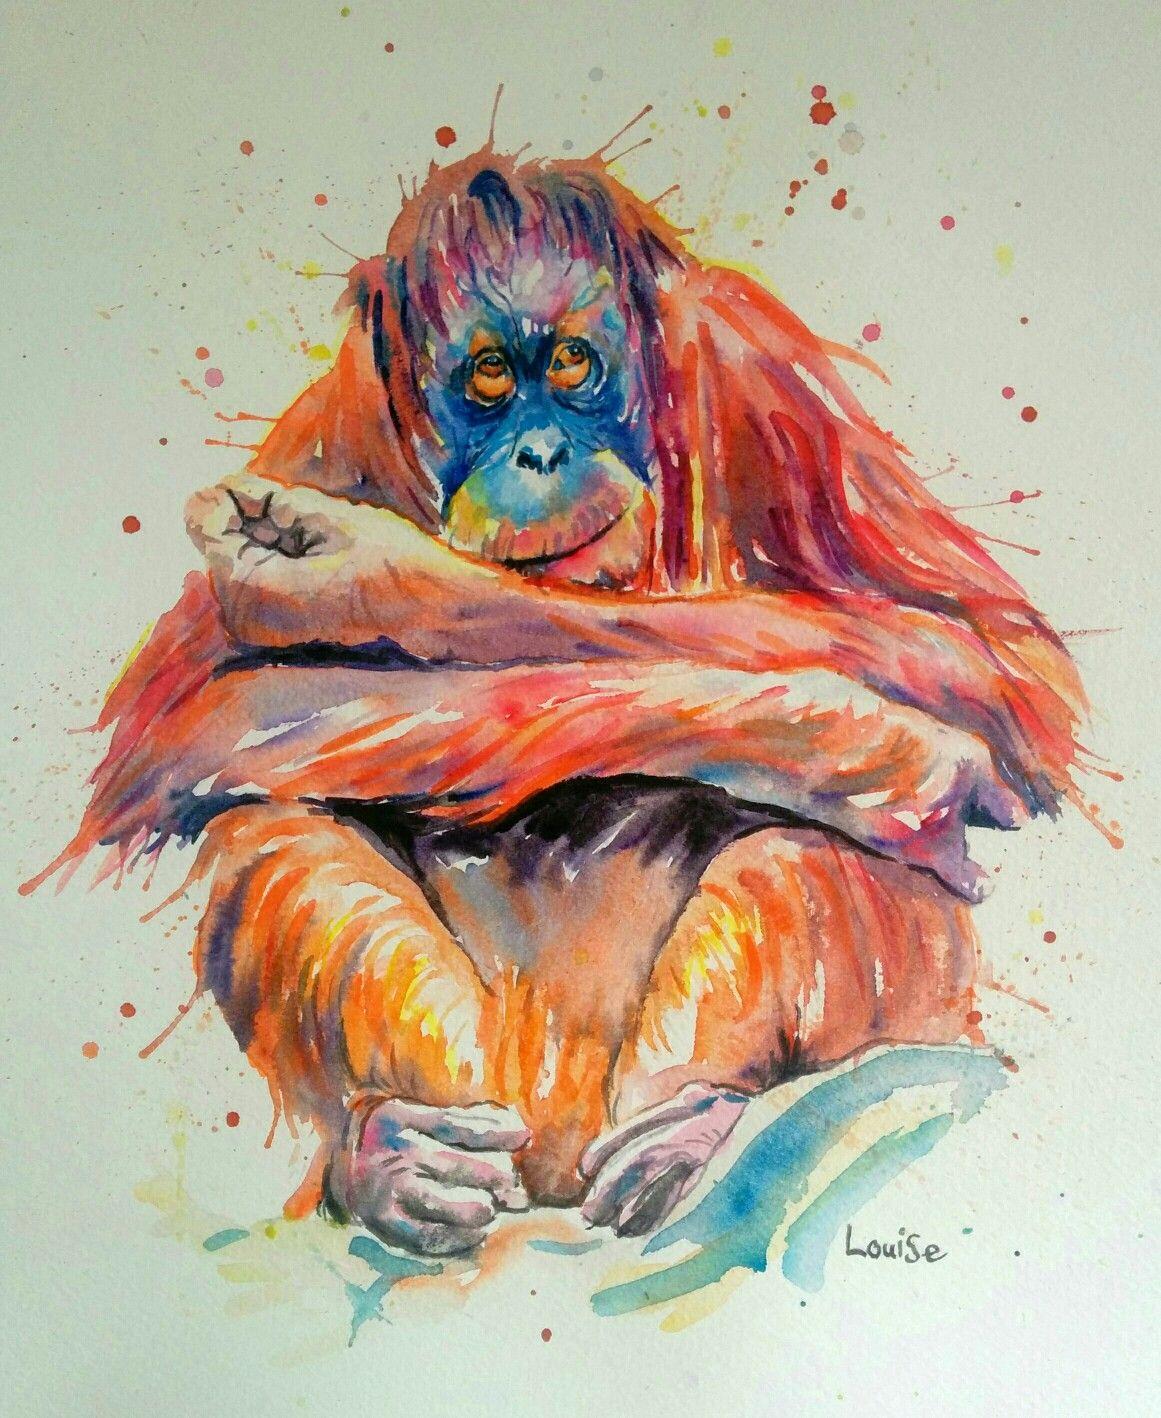 83c63c01c Watercolour Orangutan Work With Animals, Palm Oil, Watercolor Animals,  Watercolour, Watercolor Portraits